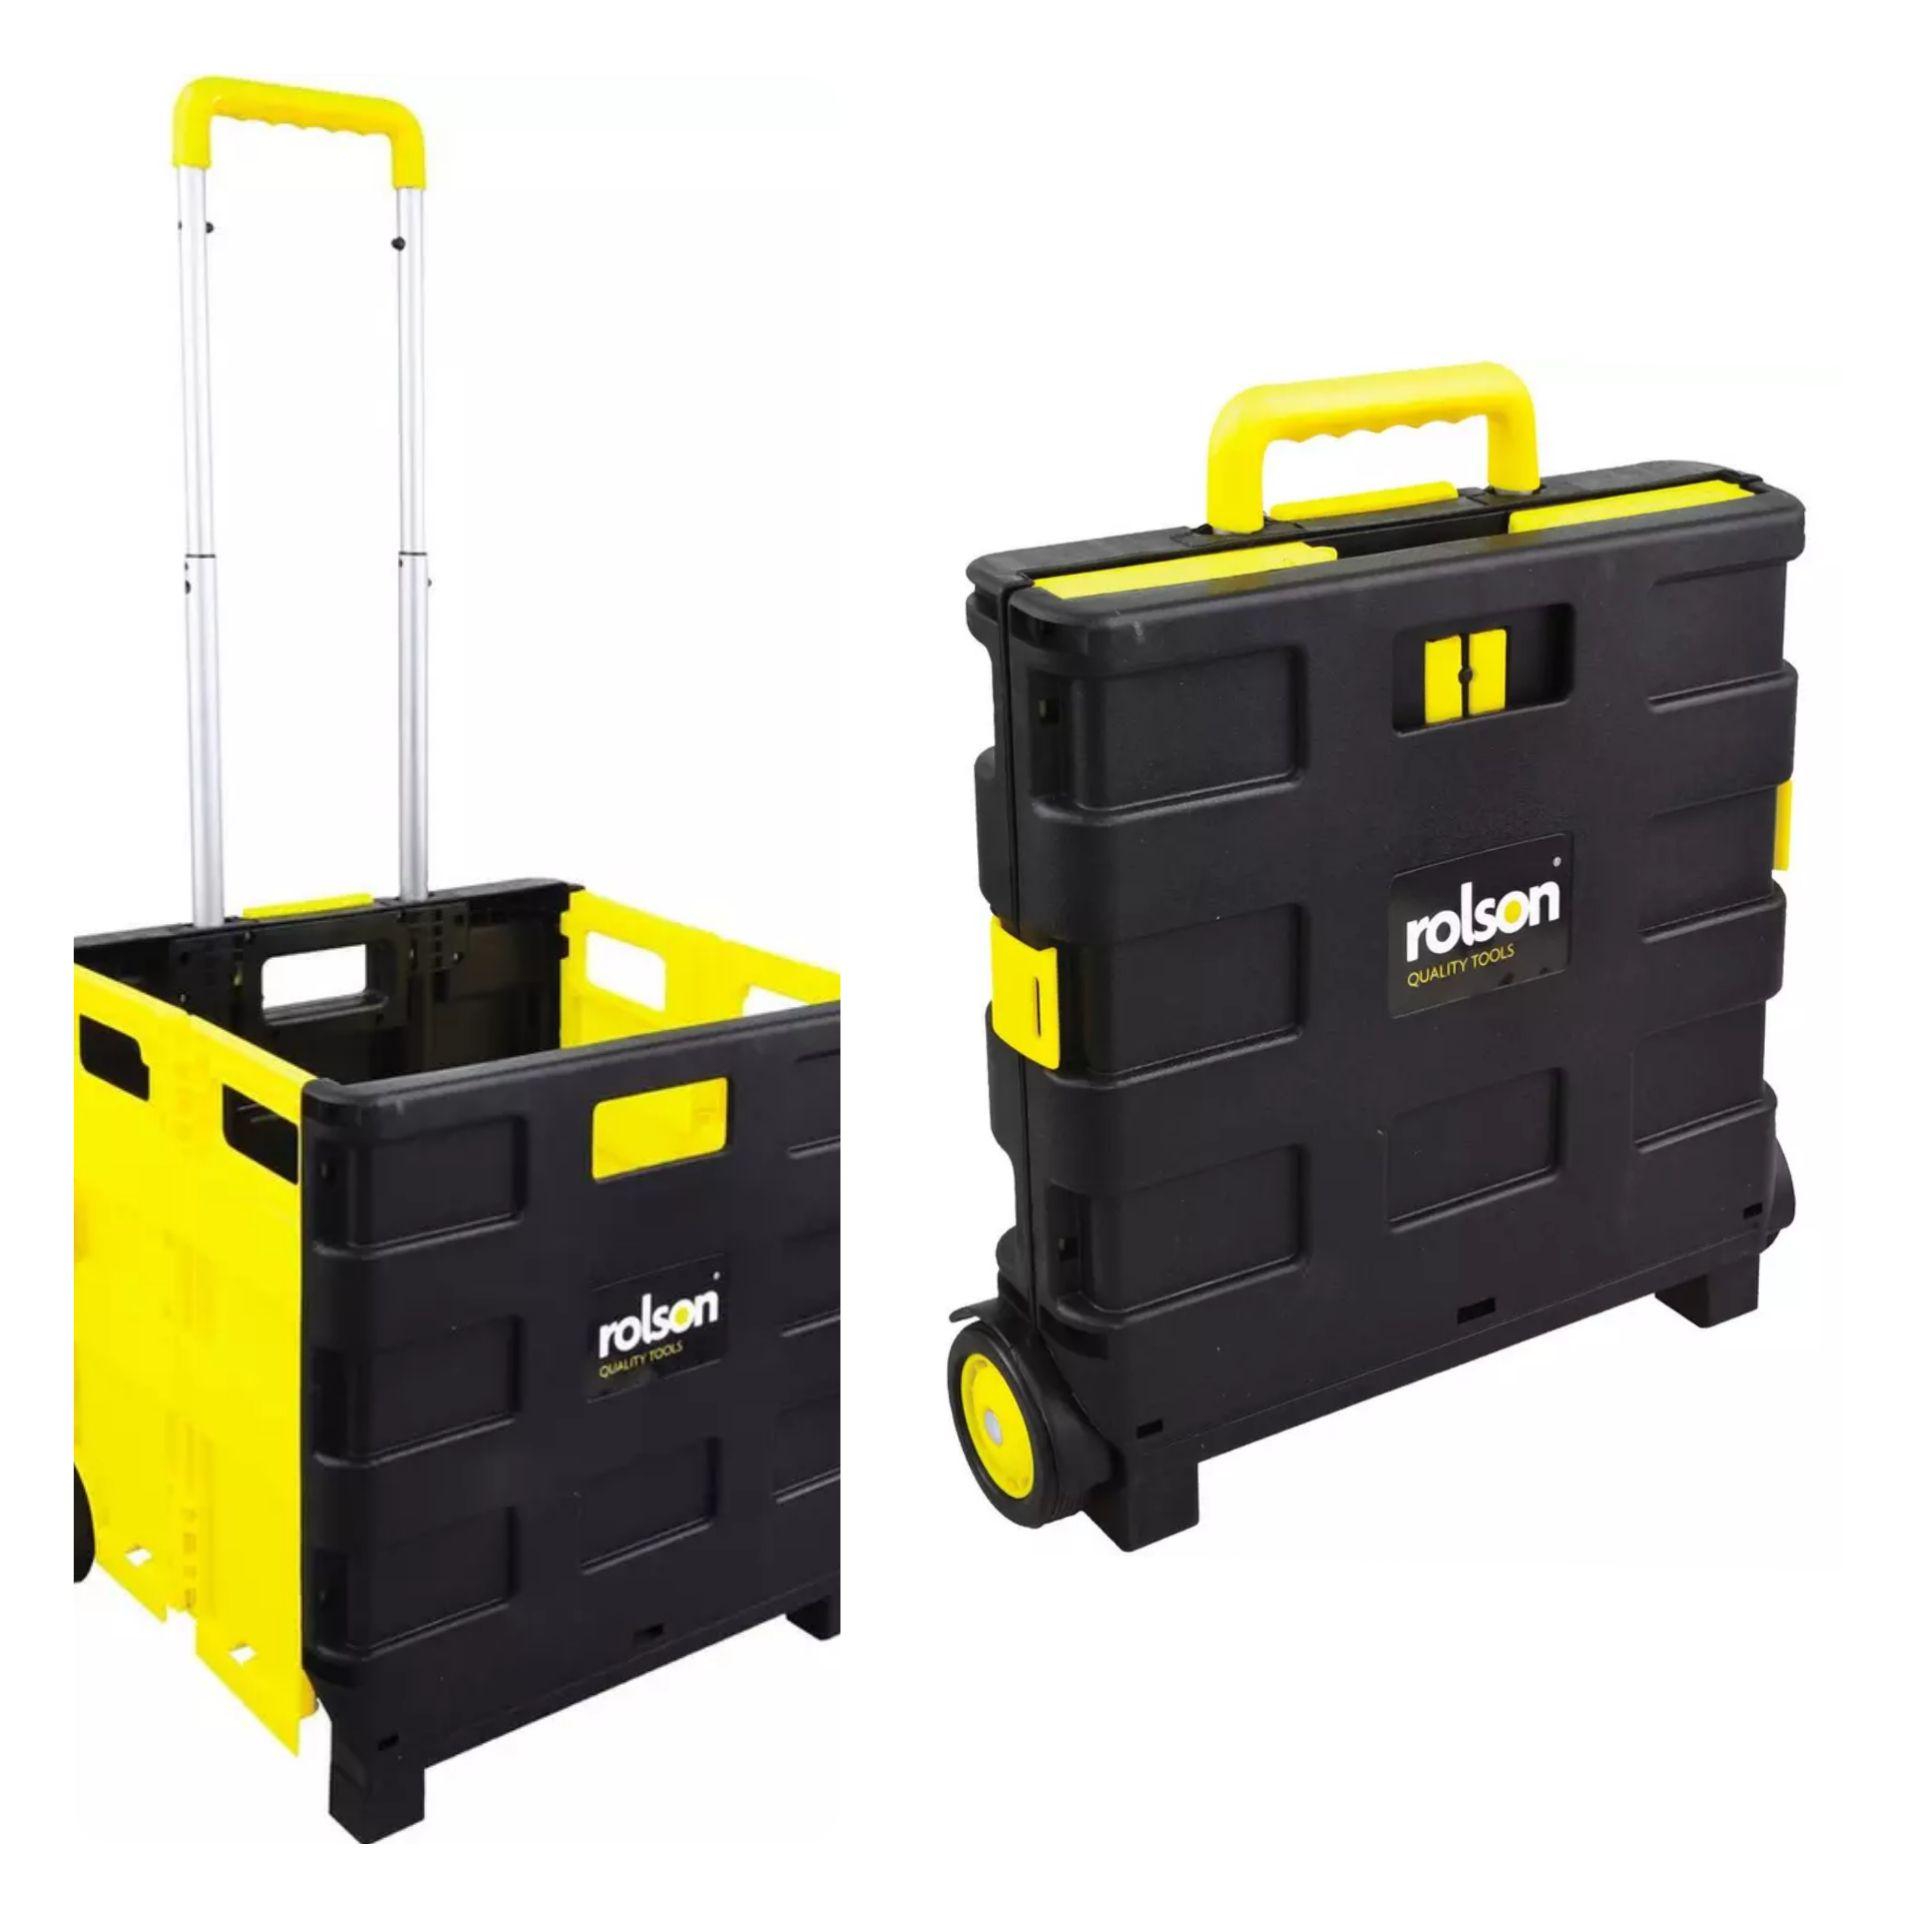 Rolson Rol-Xtra 68900 Folding Boot Cart, 25 kg - £10.94@ Amazon (£4.49 p&p non Prime)